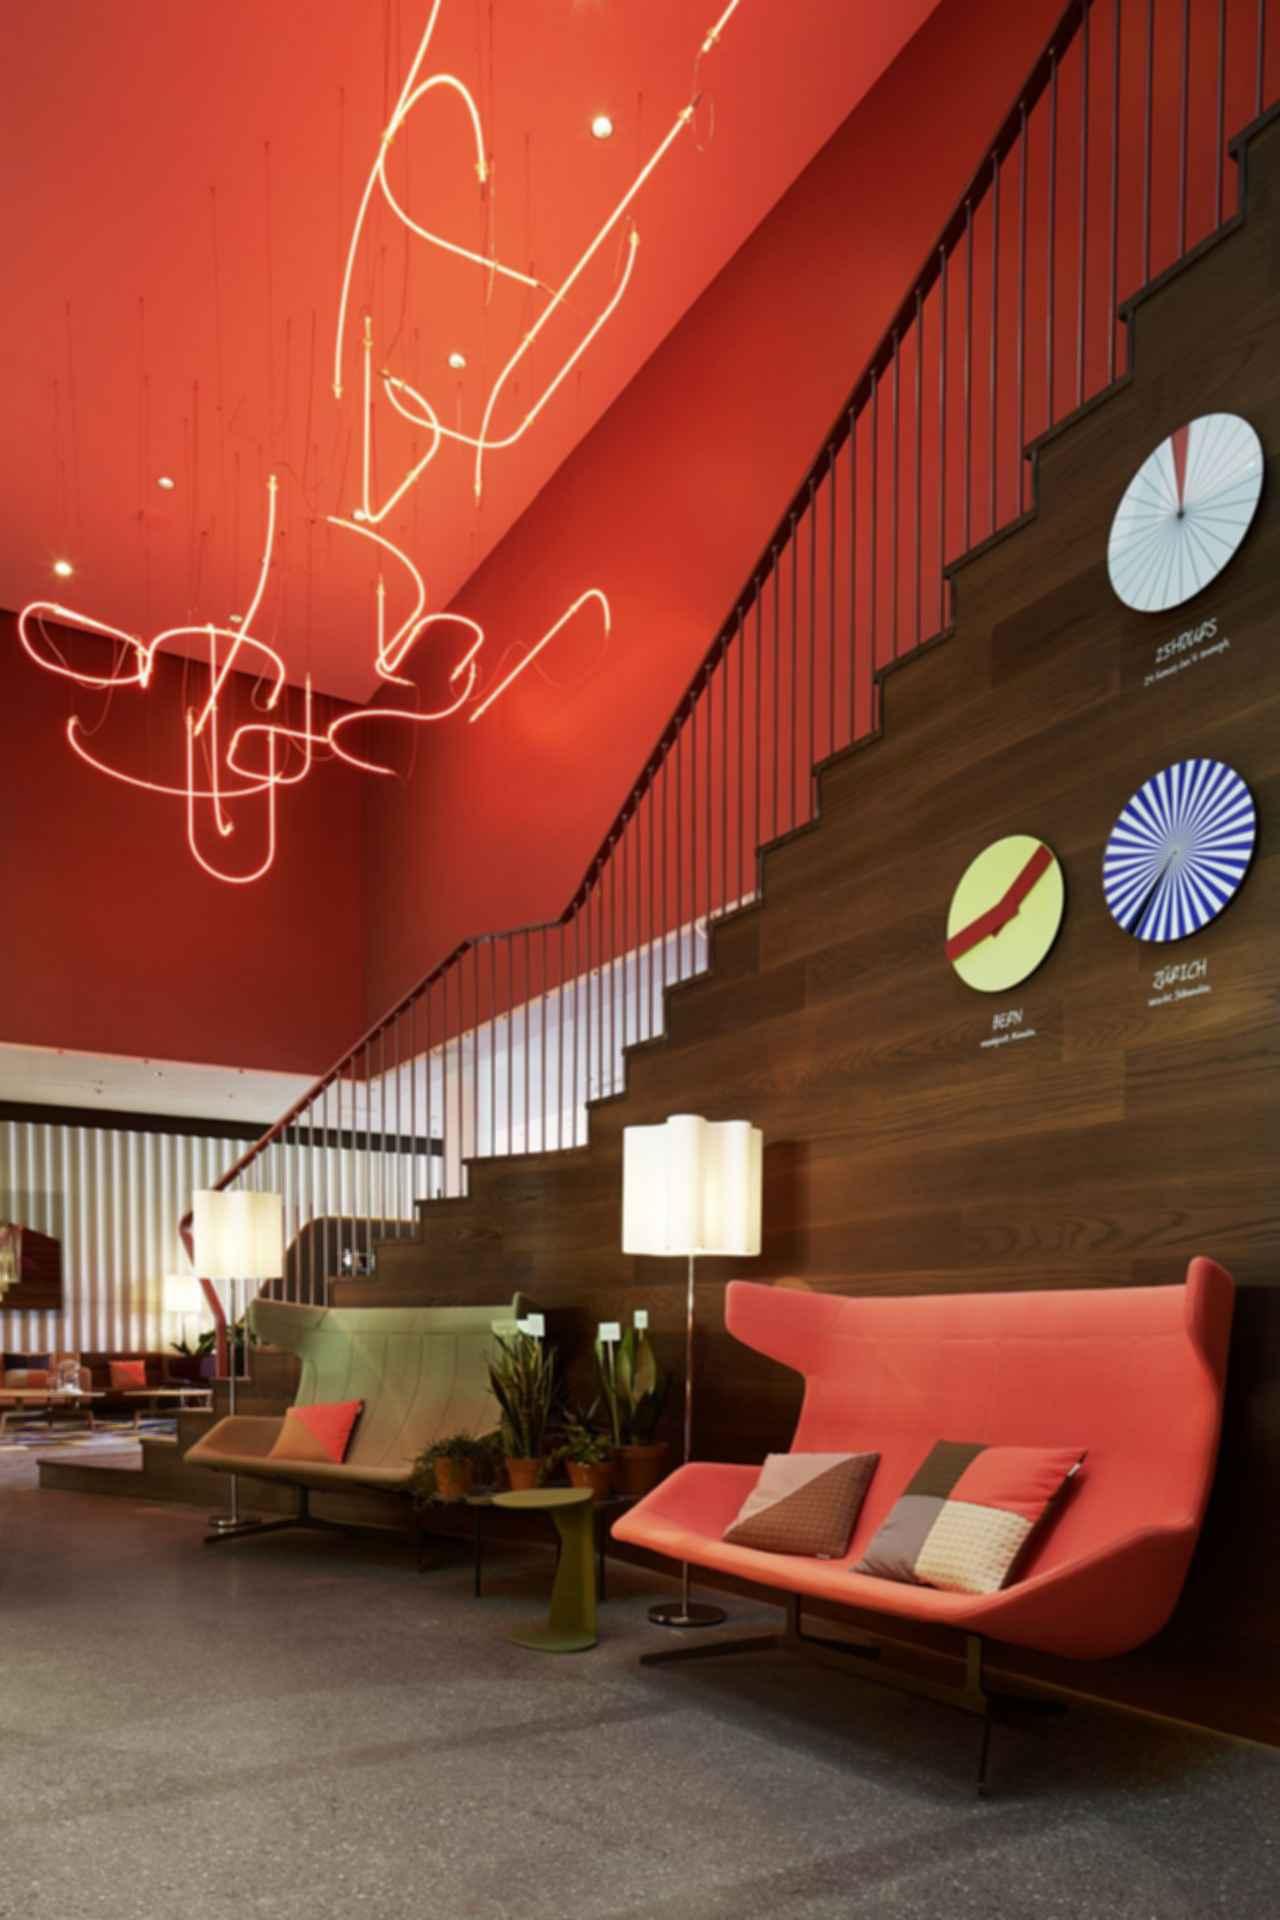 25hours Hotel Zurich West - Lounge Area